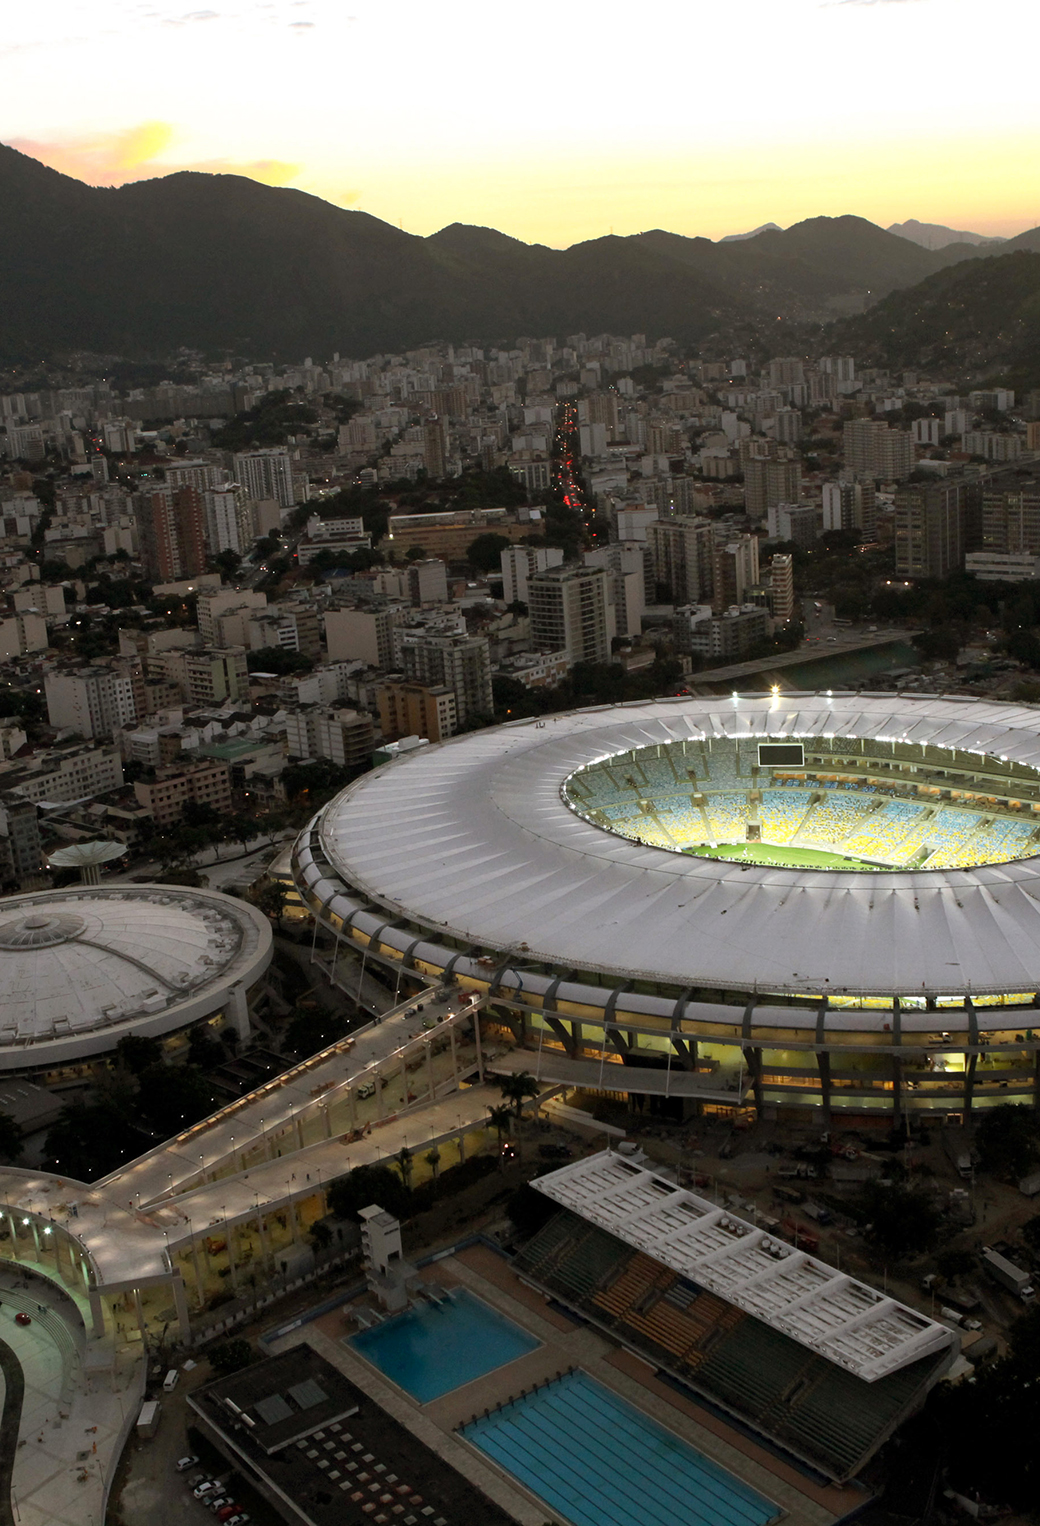 Beautiful stadium World Cup in Brazil 2014 3Wallpaper iPhone Parallax Beautiful Stadium World Cup in Brazil 2014